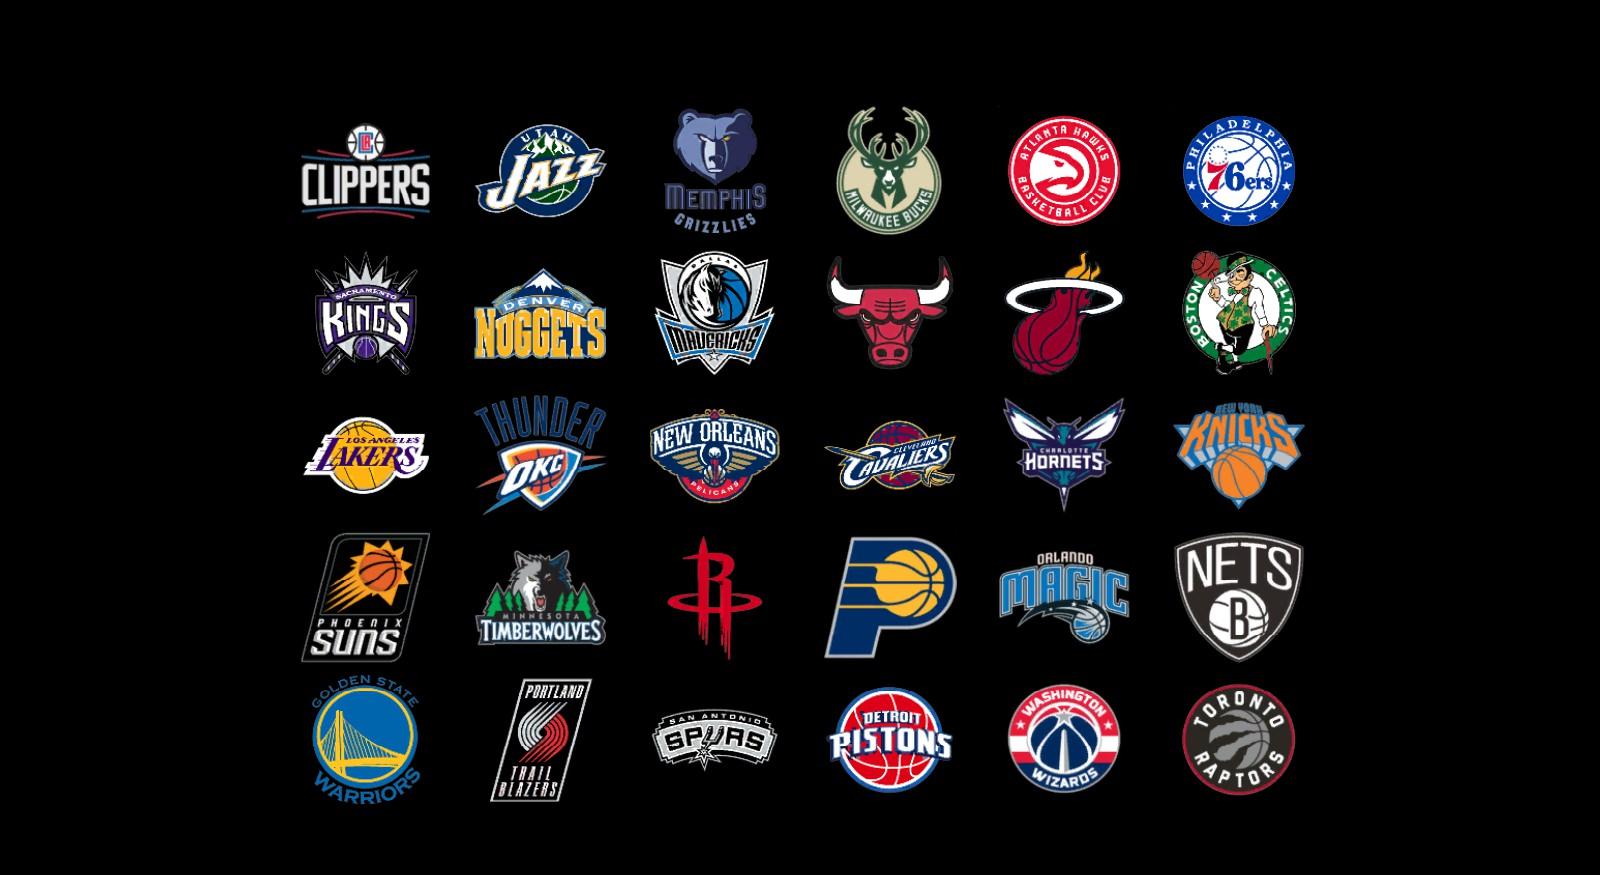 NBA 2k14 2015-2016 NBA Logos Bootup Screen Patch